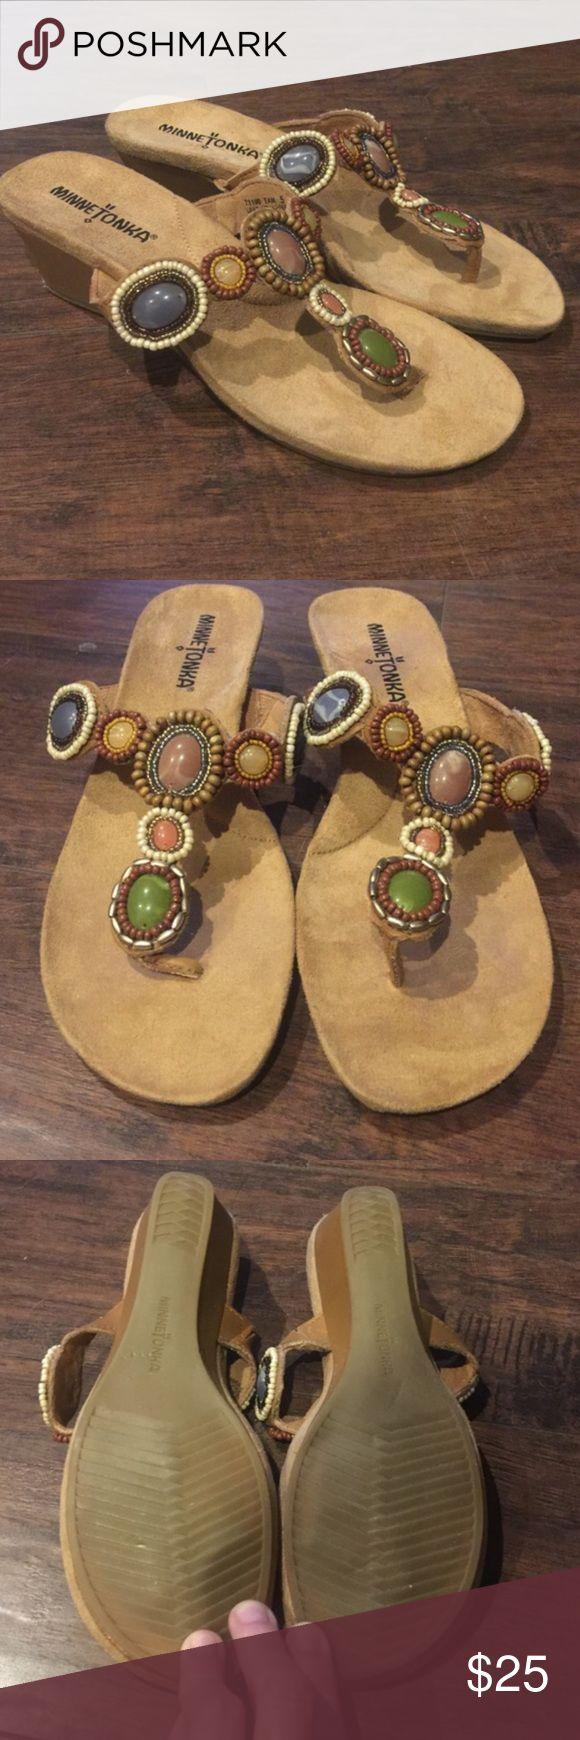 🎉Sale🎉 New Minnetonka Sandals New without box Minnetonka sandals size 5 Minnetonka Shoes Sandals